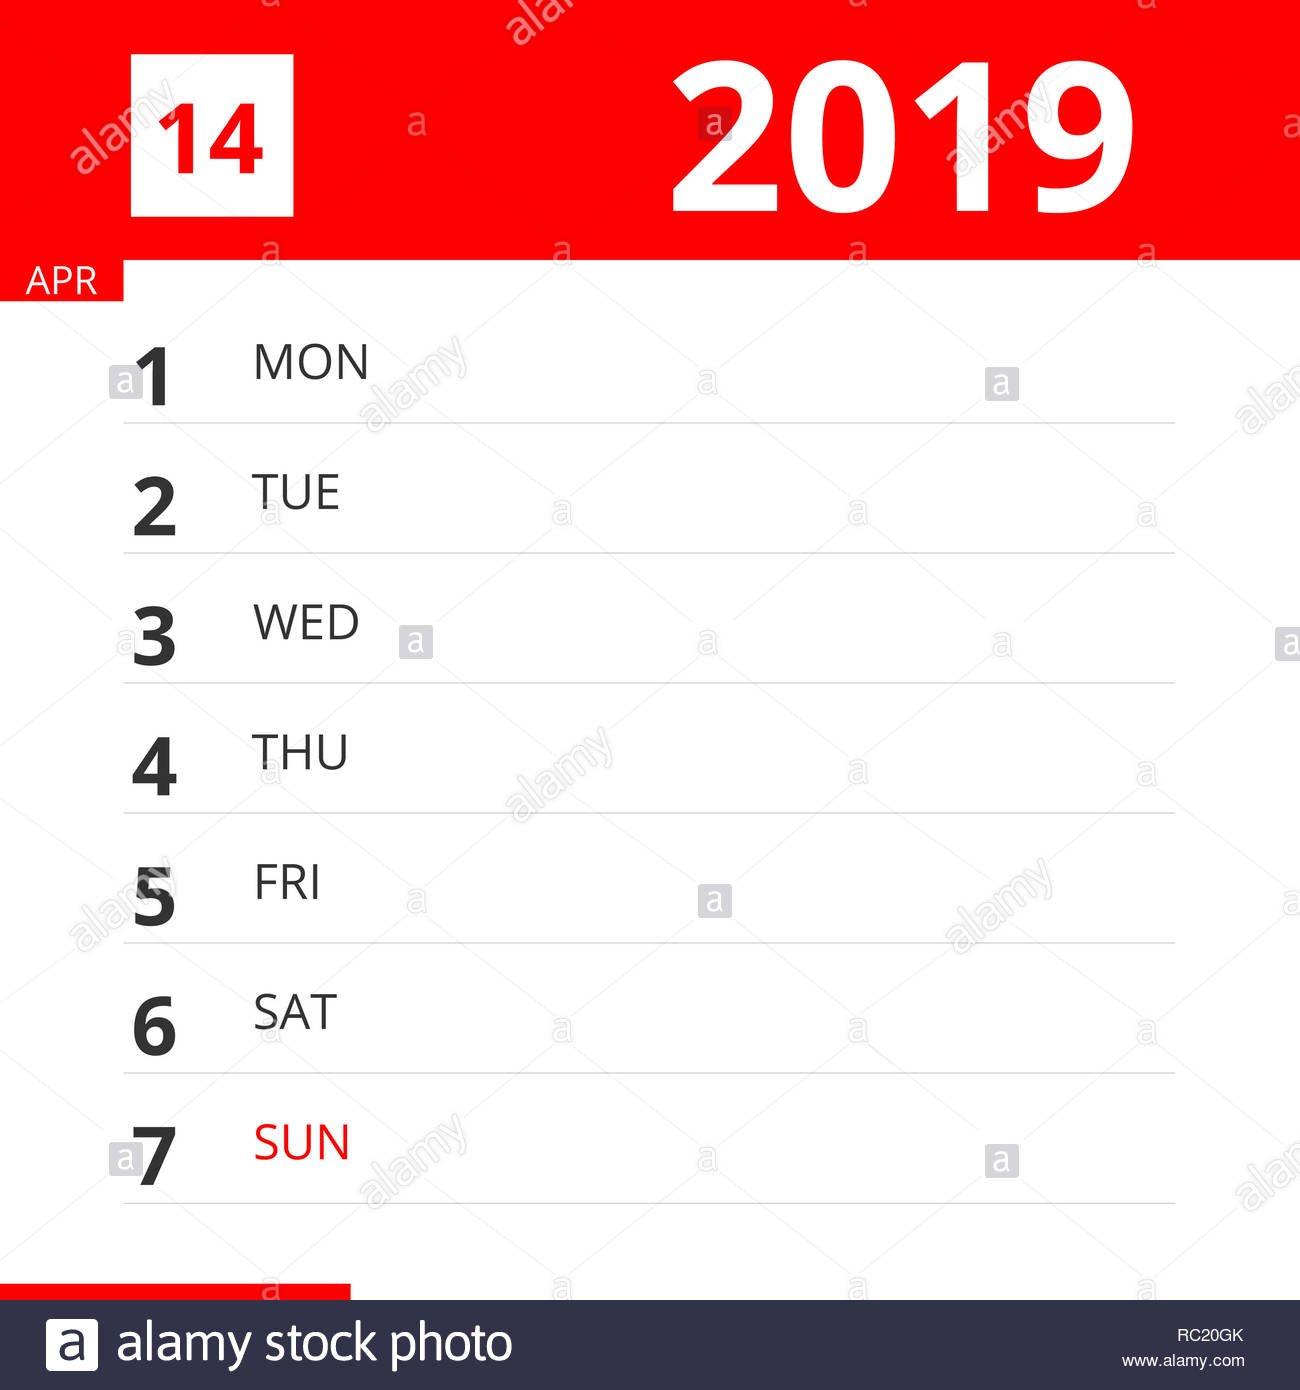 Calendar Planner For Week 14 In 2019, Ends April 7, 2019 Stock Photo Calendar Week 14 2019